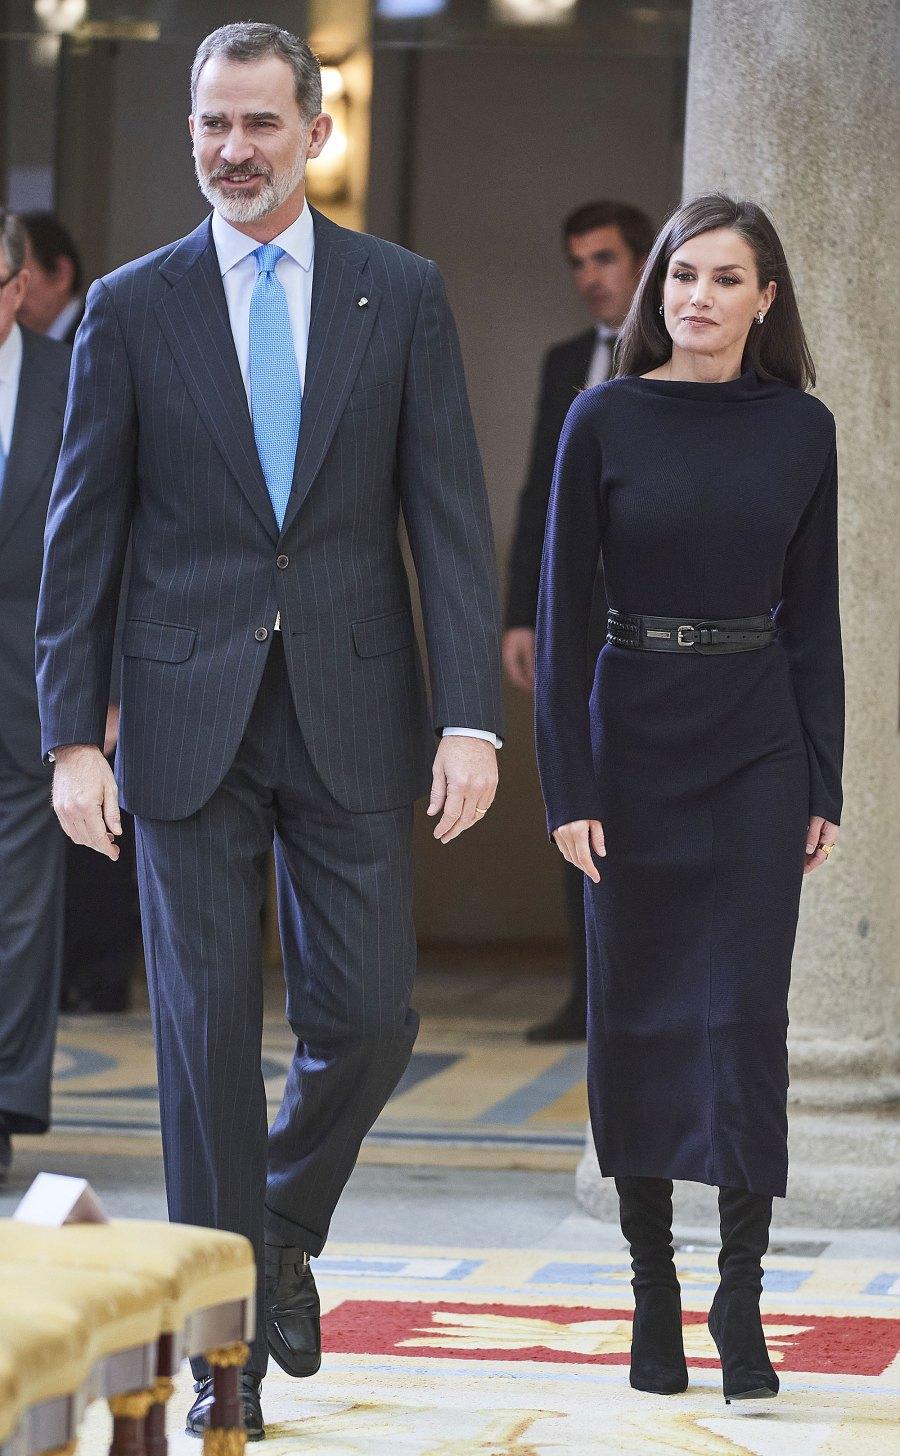 Queen Letizia Black Mididress February 17, 2020